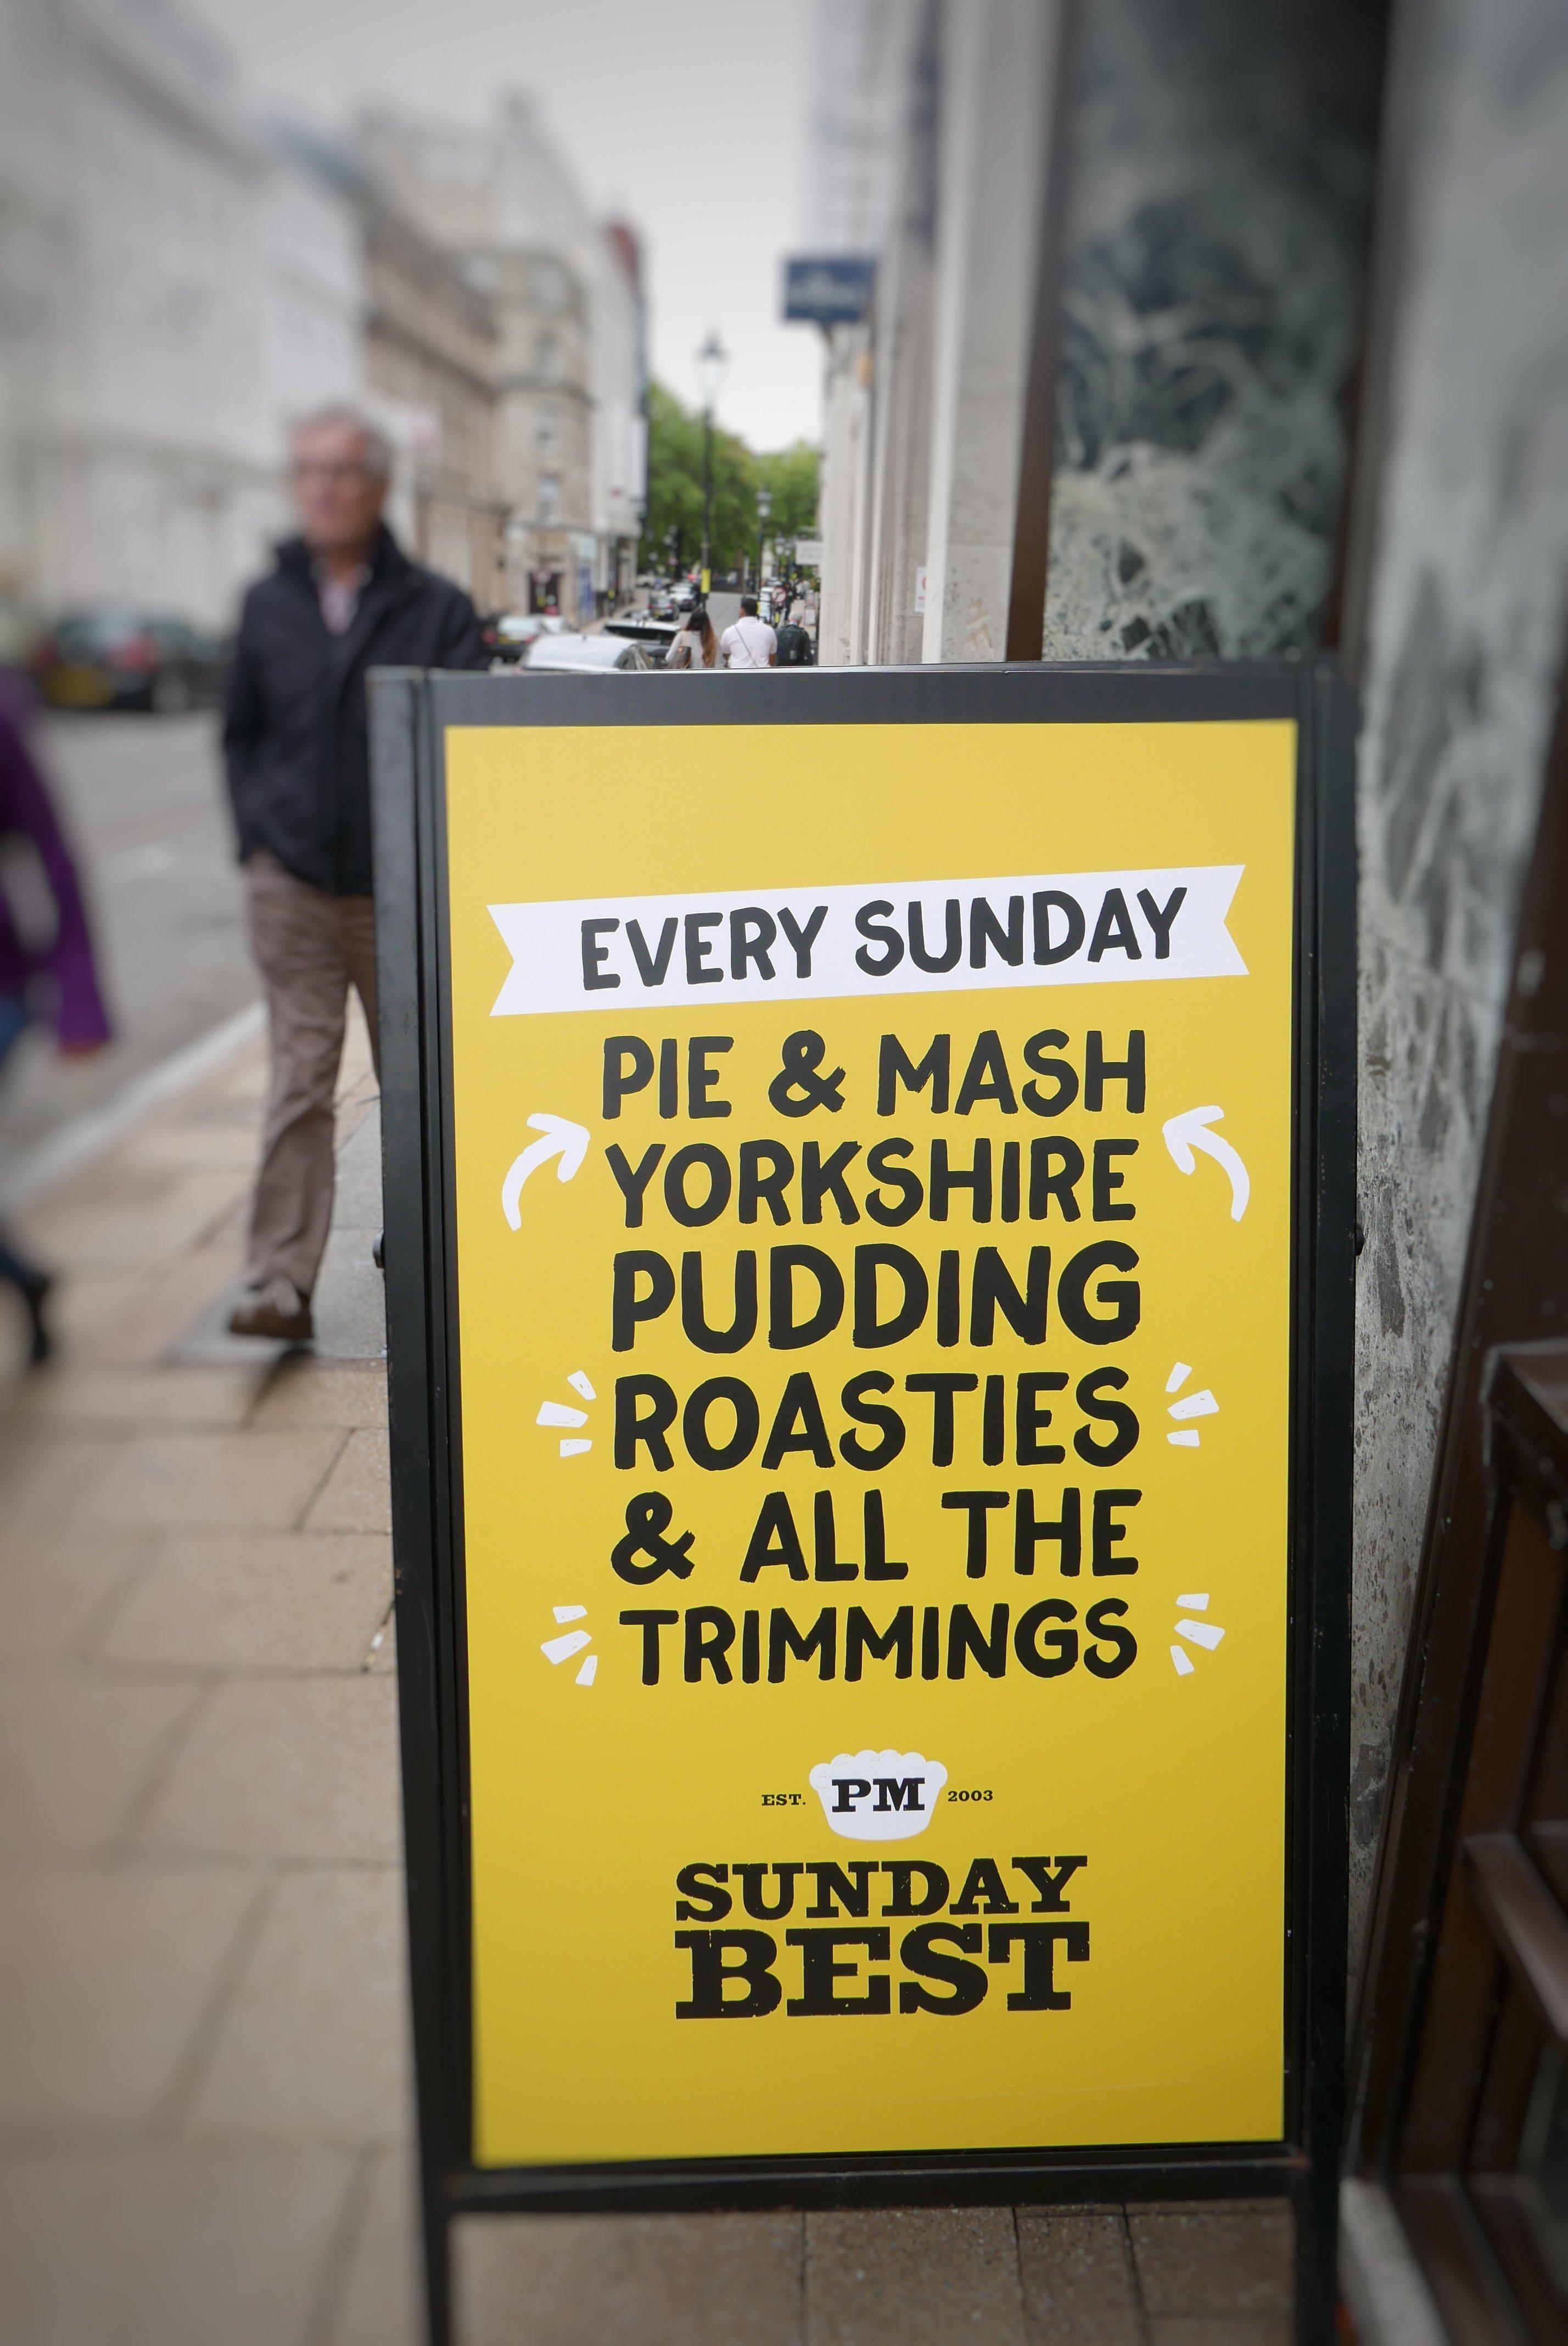 Sunday Best at Pieminister - billboard outside Birmingham restaurant